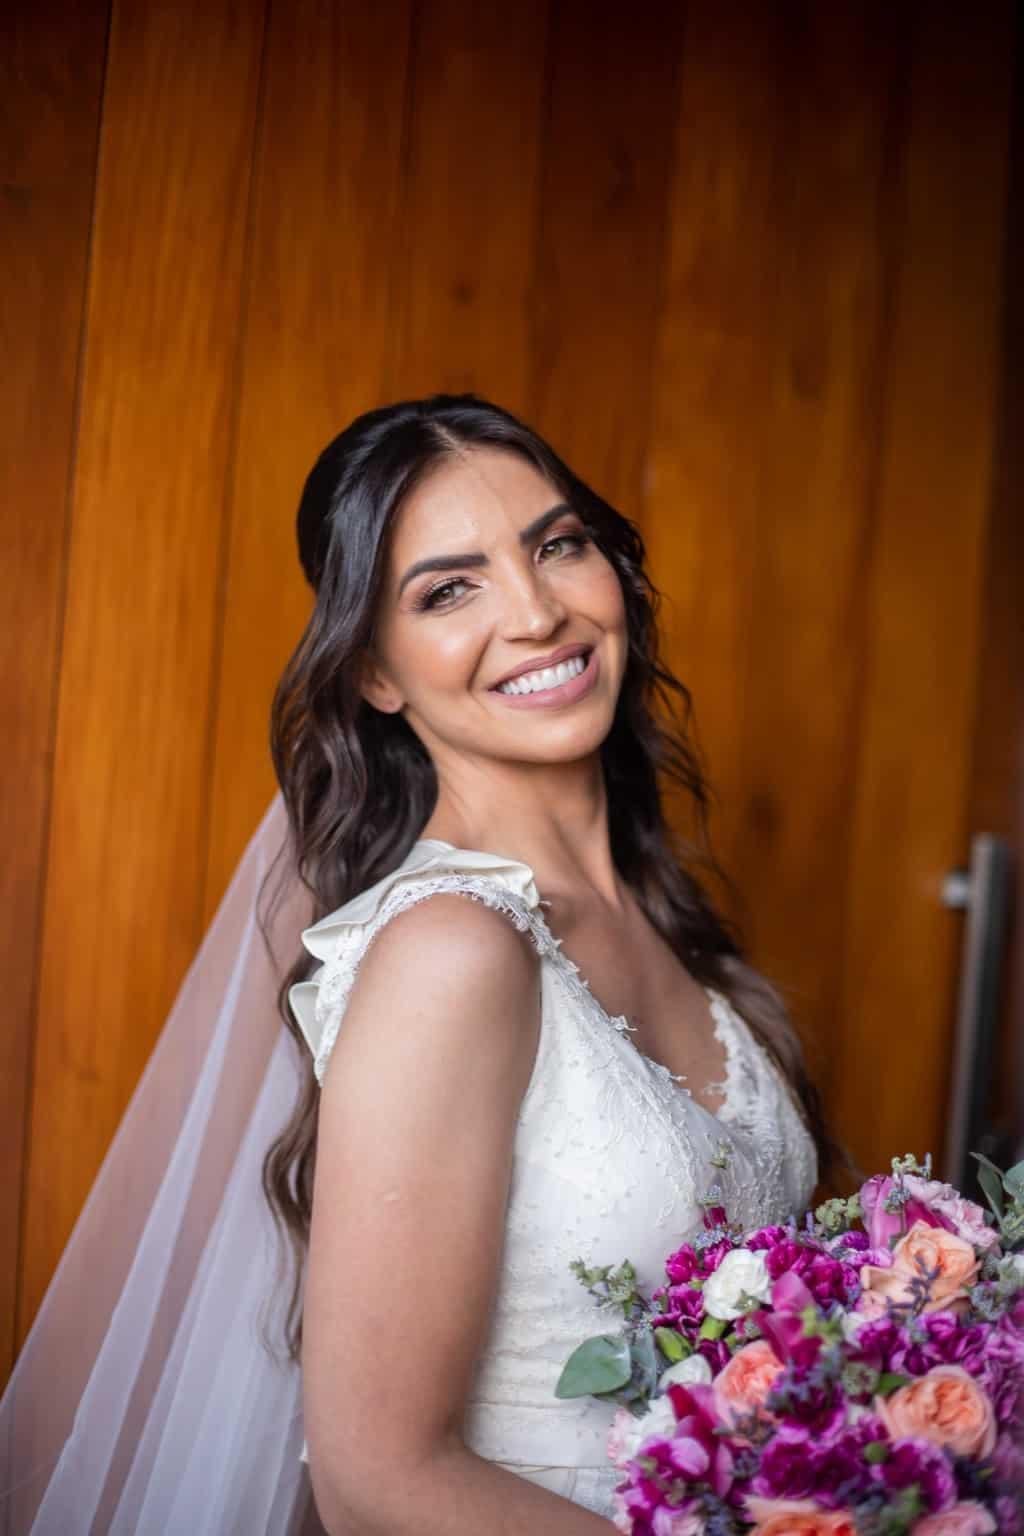 beleza-da-noiva-Casamento-Juliana-e-Sebastian-making-of-Pousada-La-Belle-Bruna71